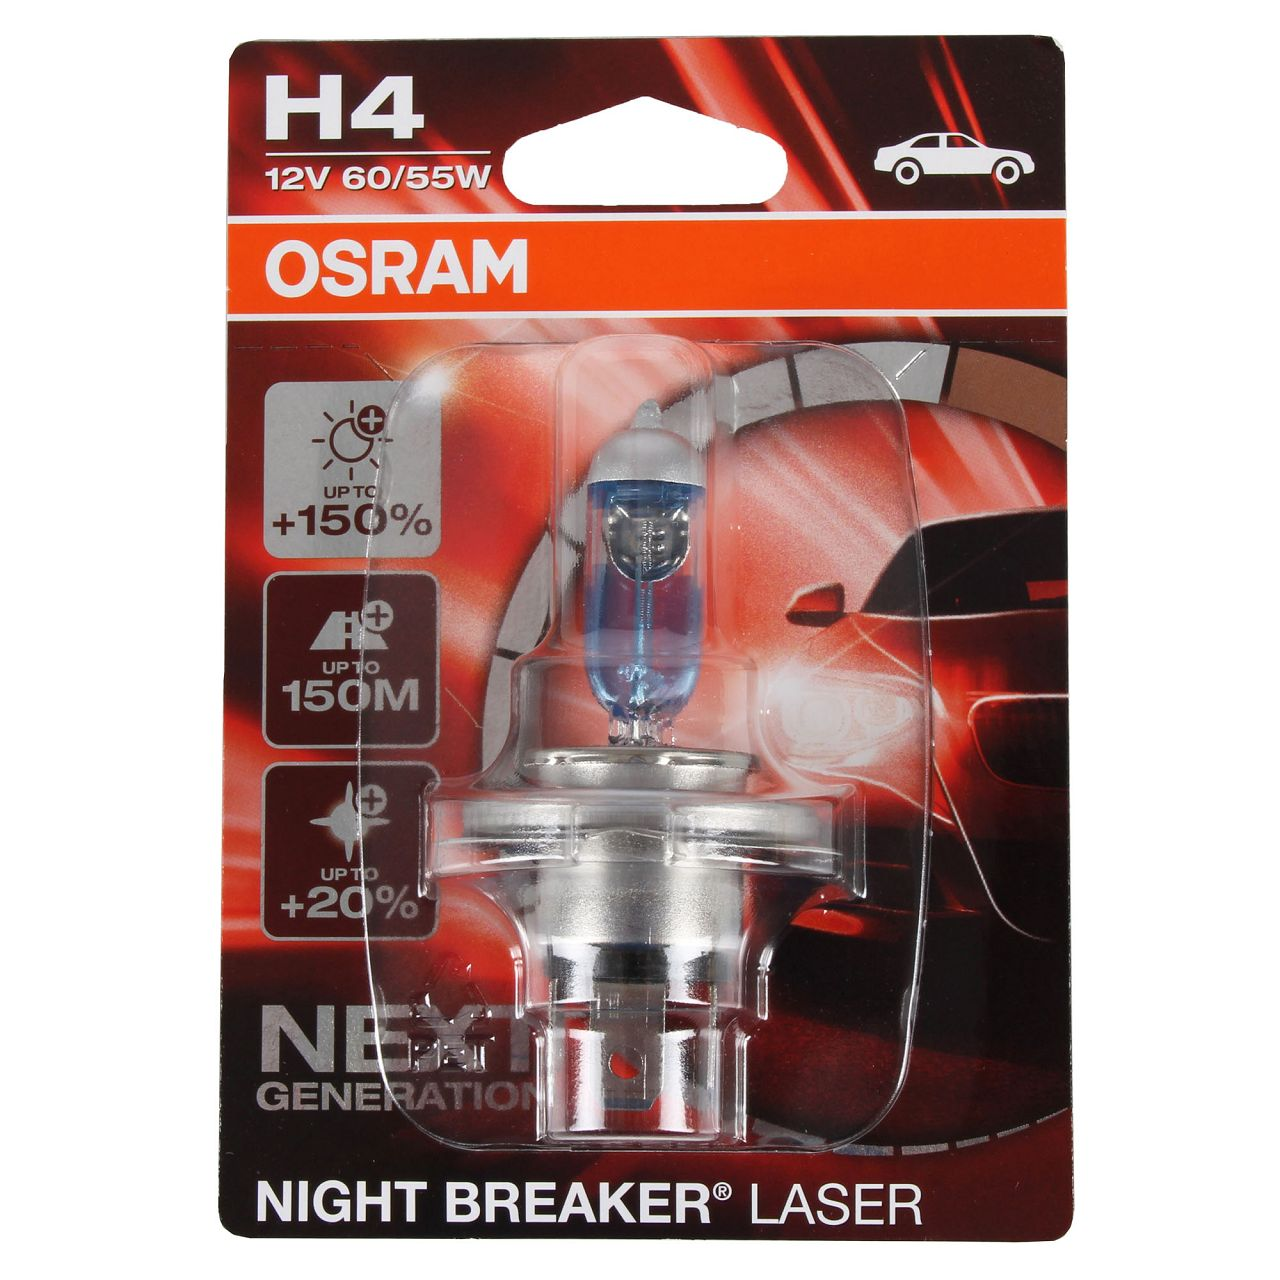 OSRAM Glühlampe H4 NIGHT BREAKER LASER 12V 60/55W P43t next Generation +150%